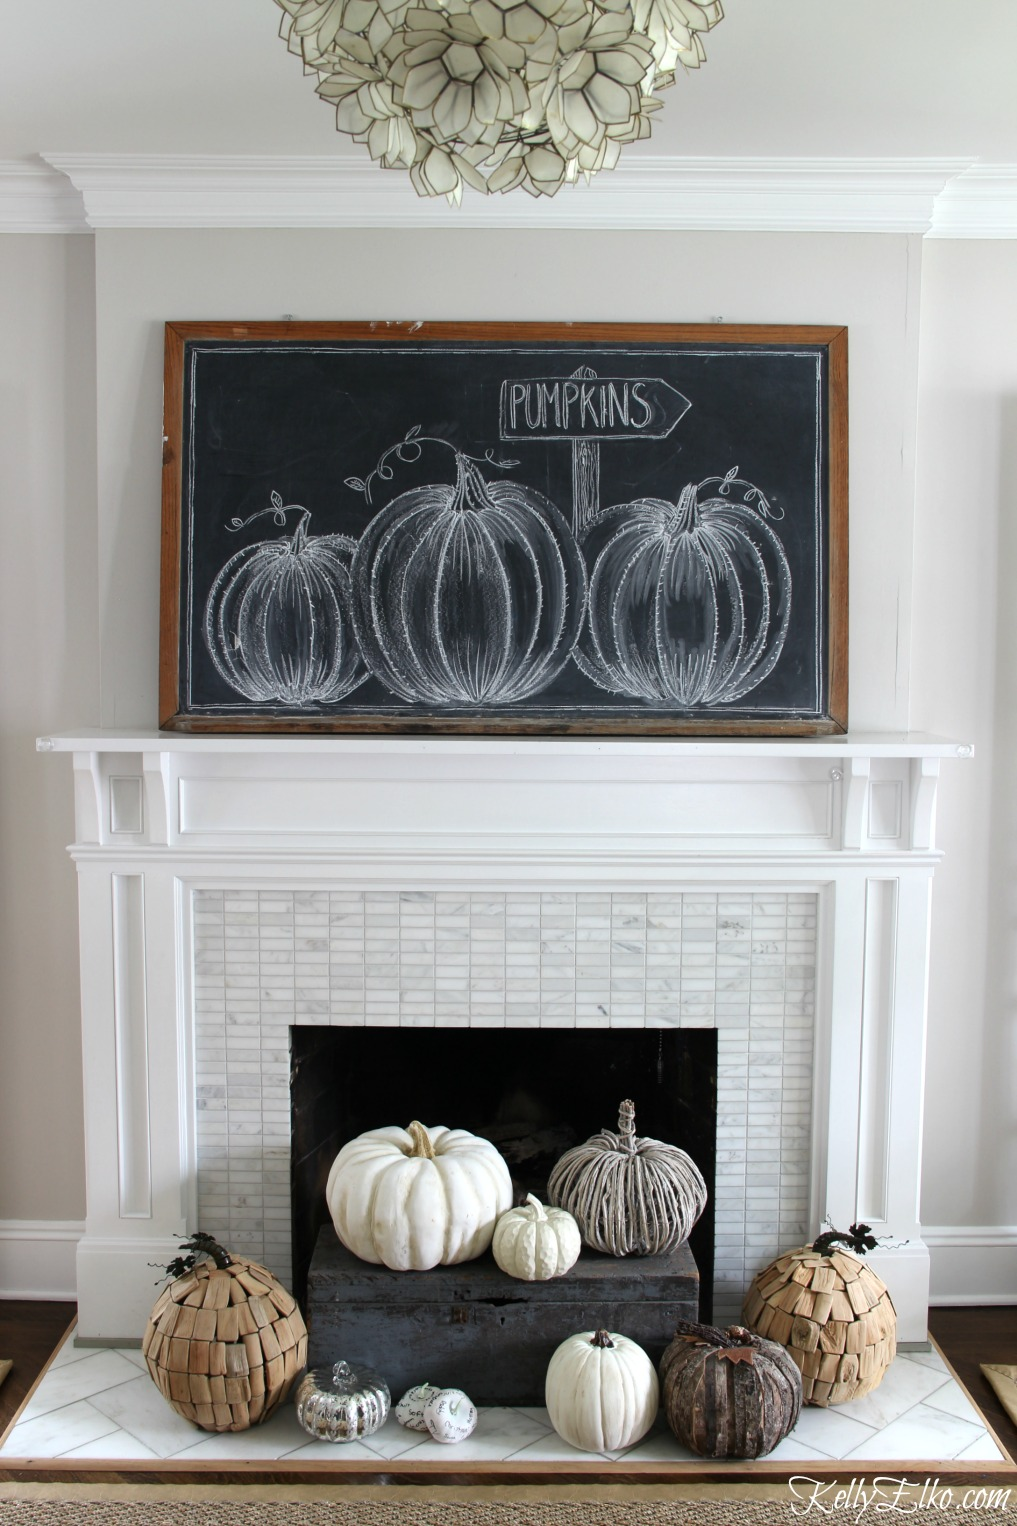 Love this farmhouse fall mantel with giant pumpkin chalkboard art and neutral pumpkins kellyelko.com